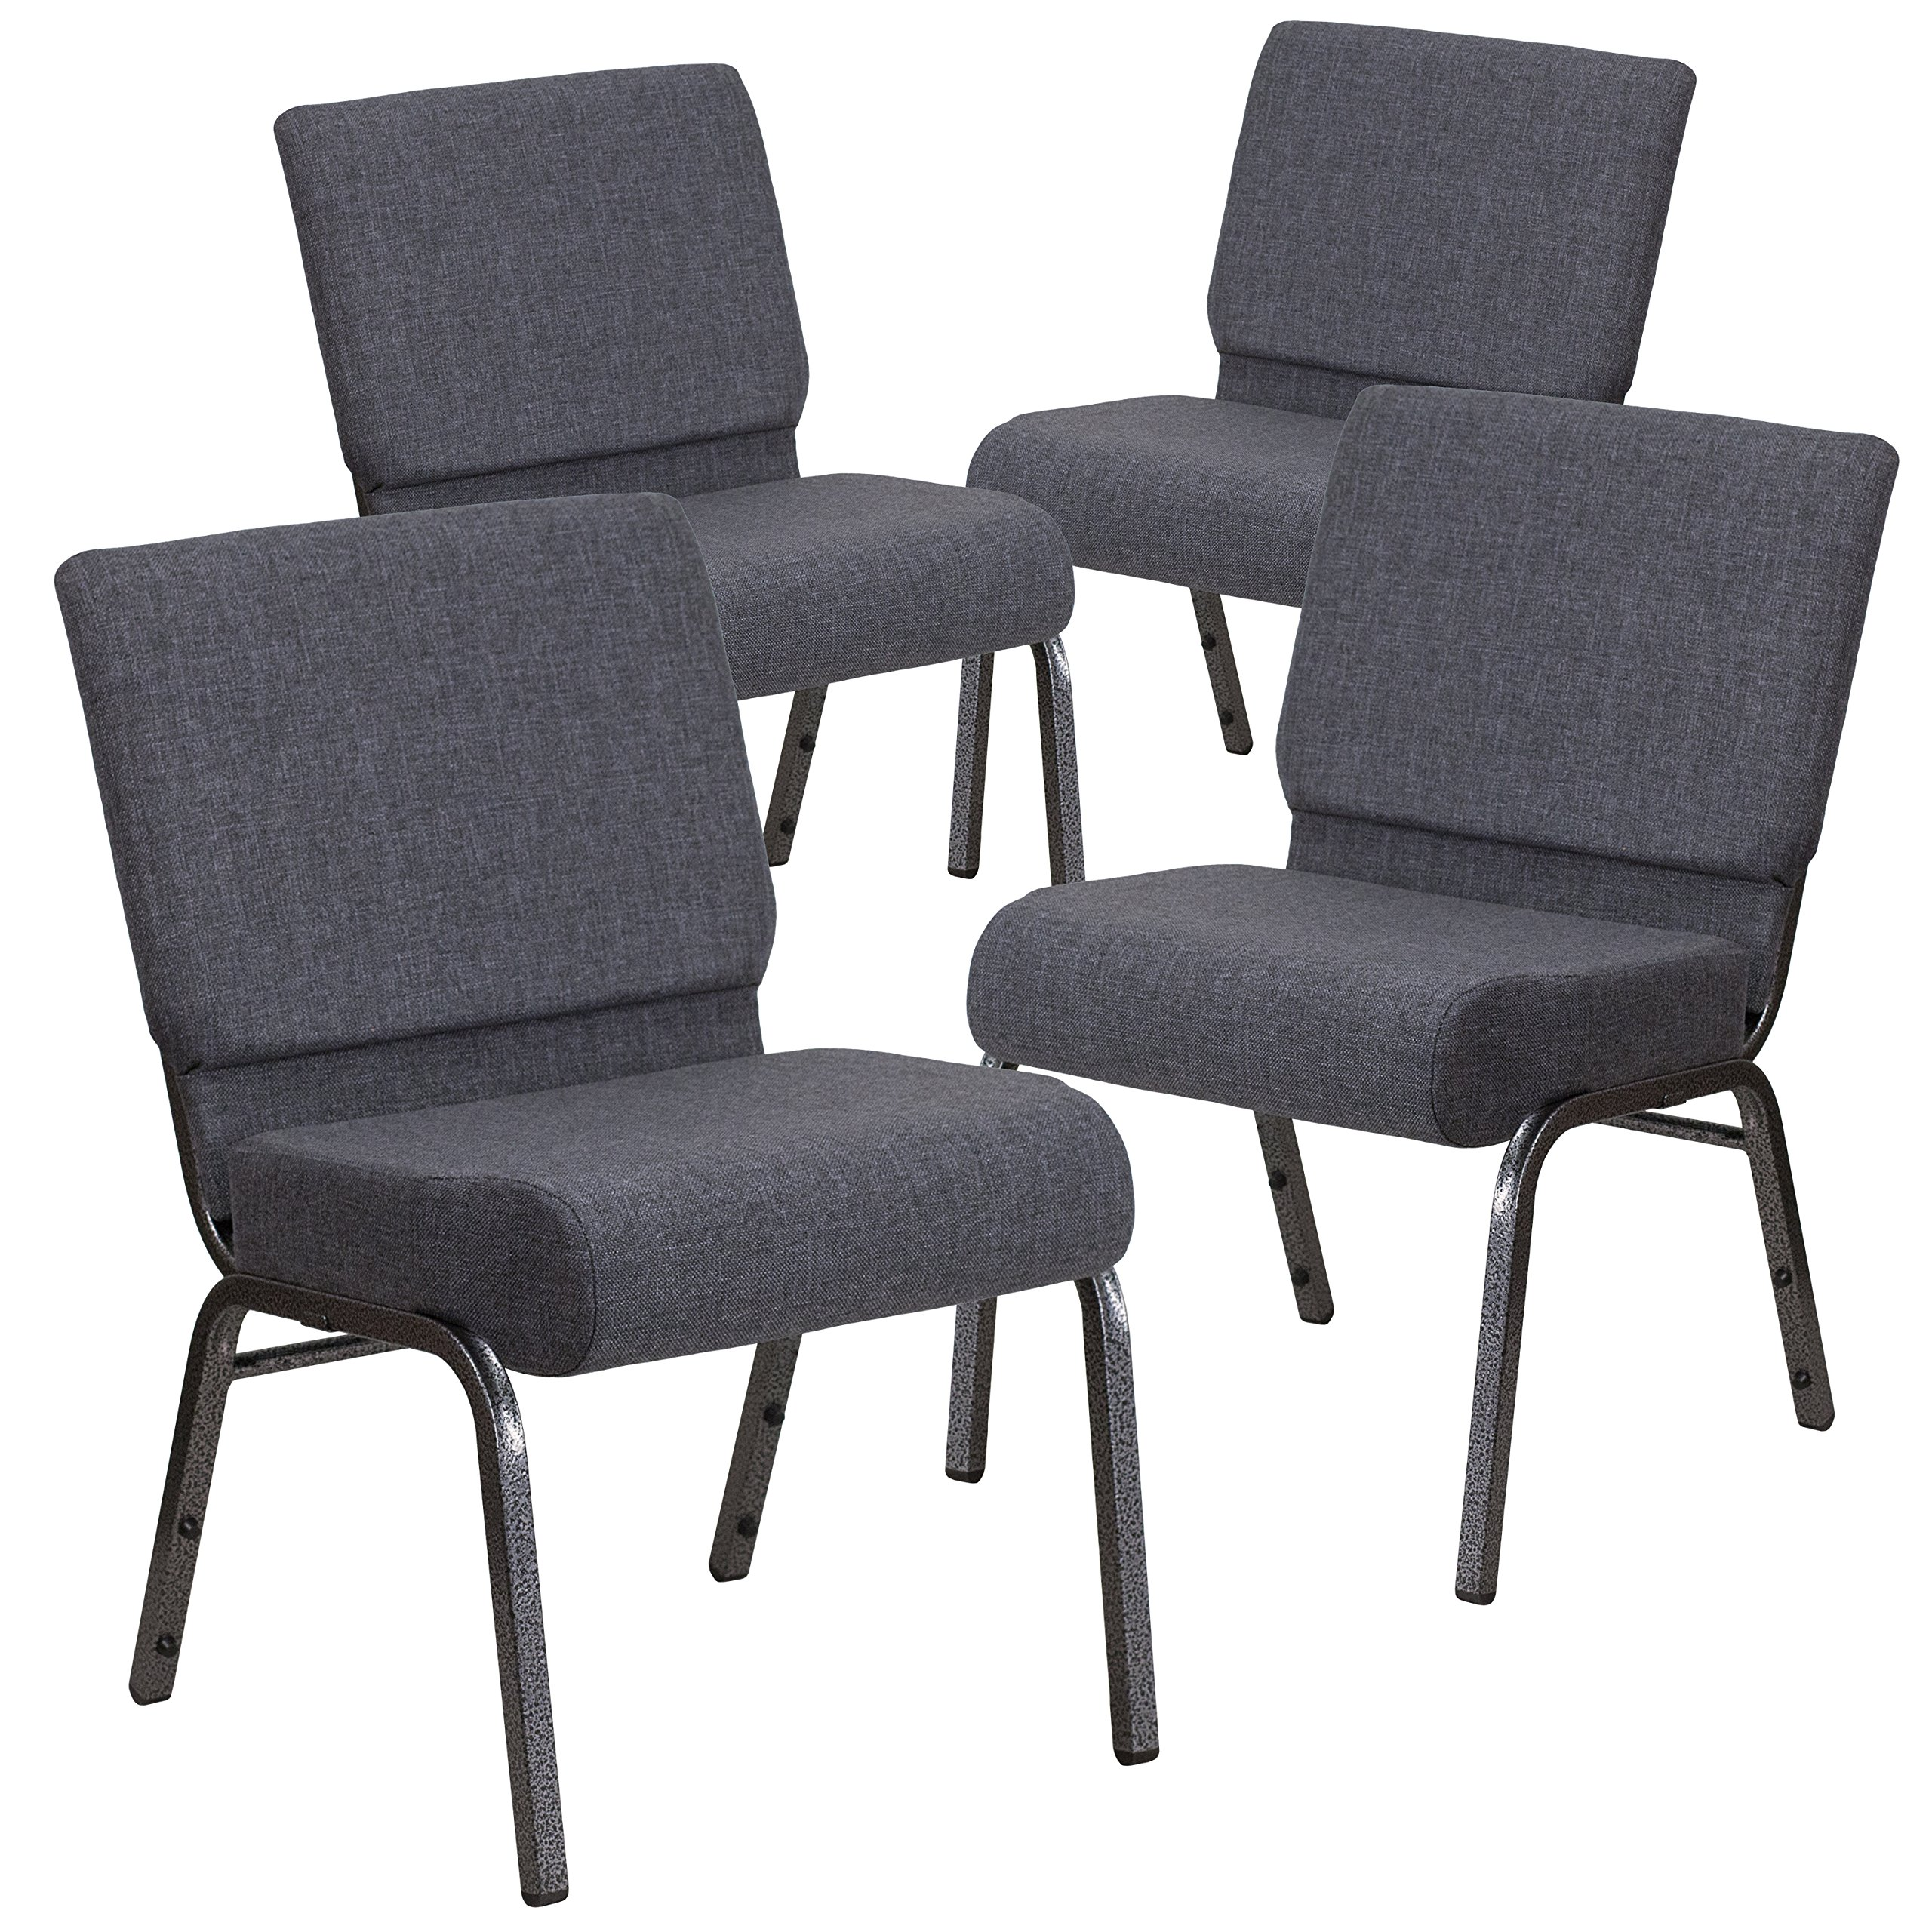 Flash Furniture 4 Pk. HERCULES Series 21''W Church Chair in Dark Gray Fabric - Silver Vein Frame by Flash Furniture